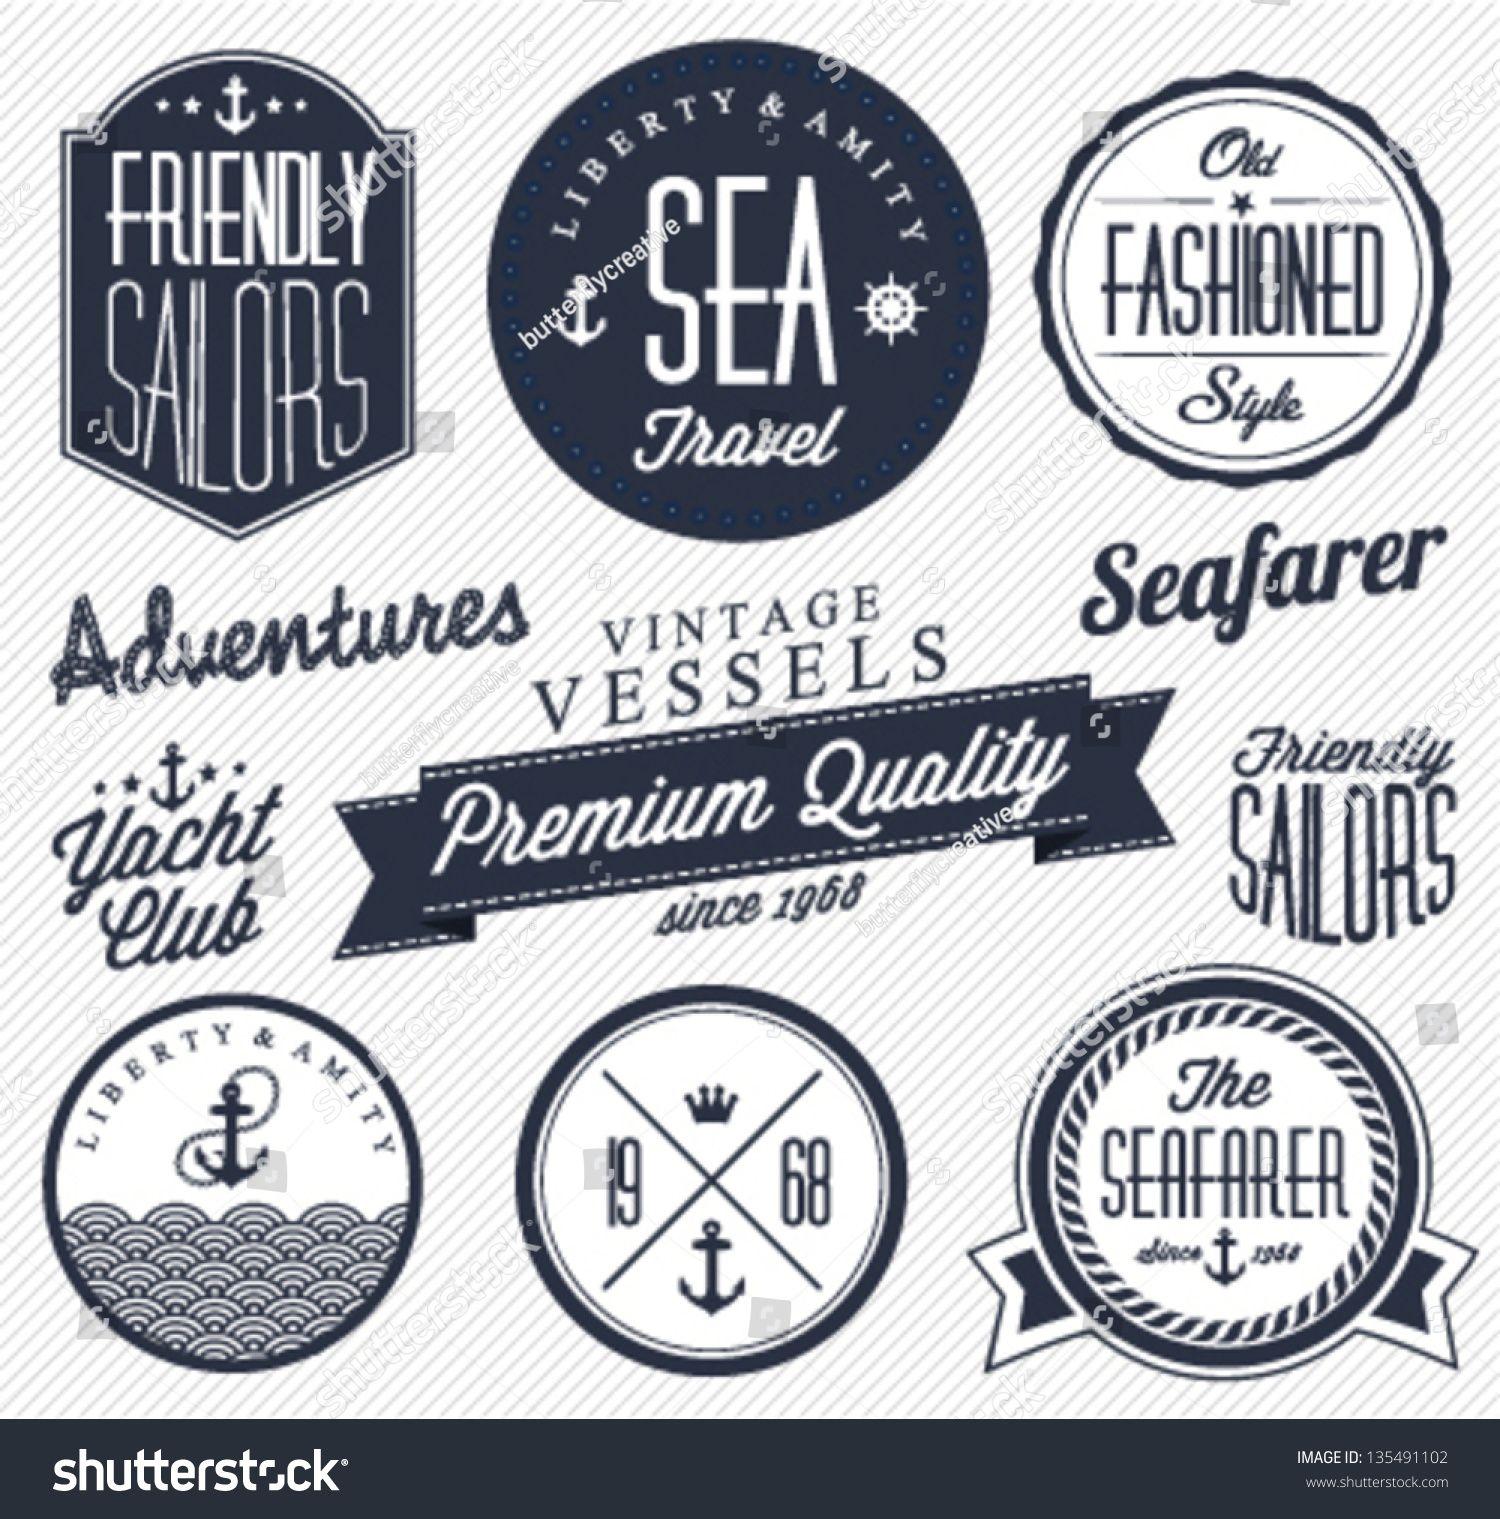 Nautical fonts vintage nautical badge design icon design logo design retro